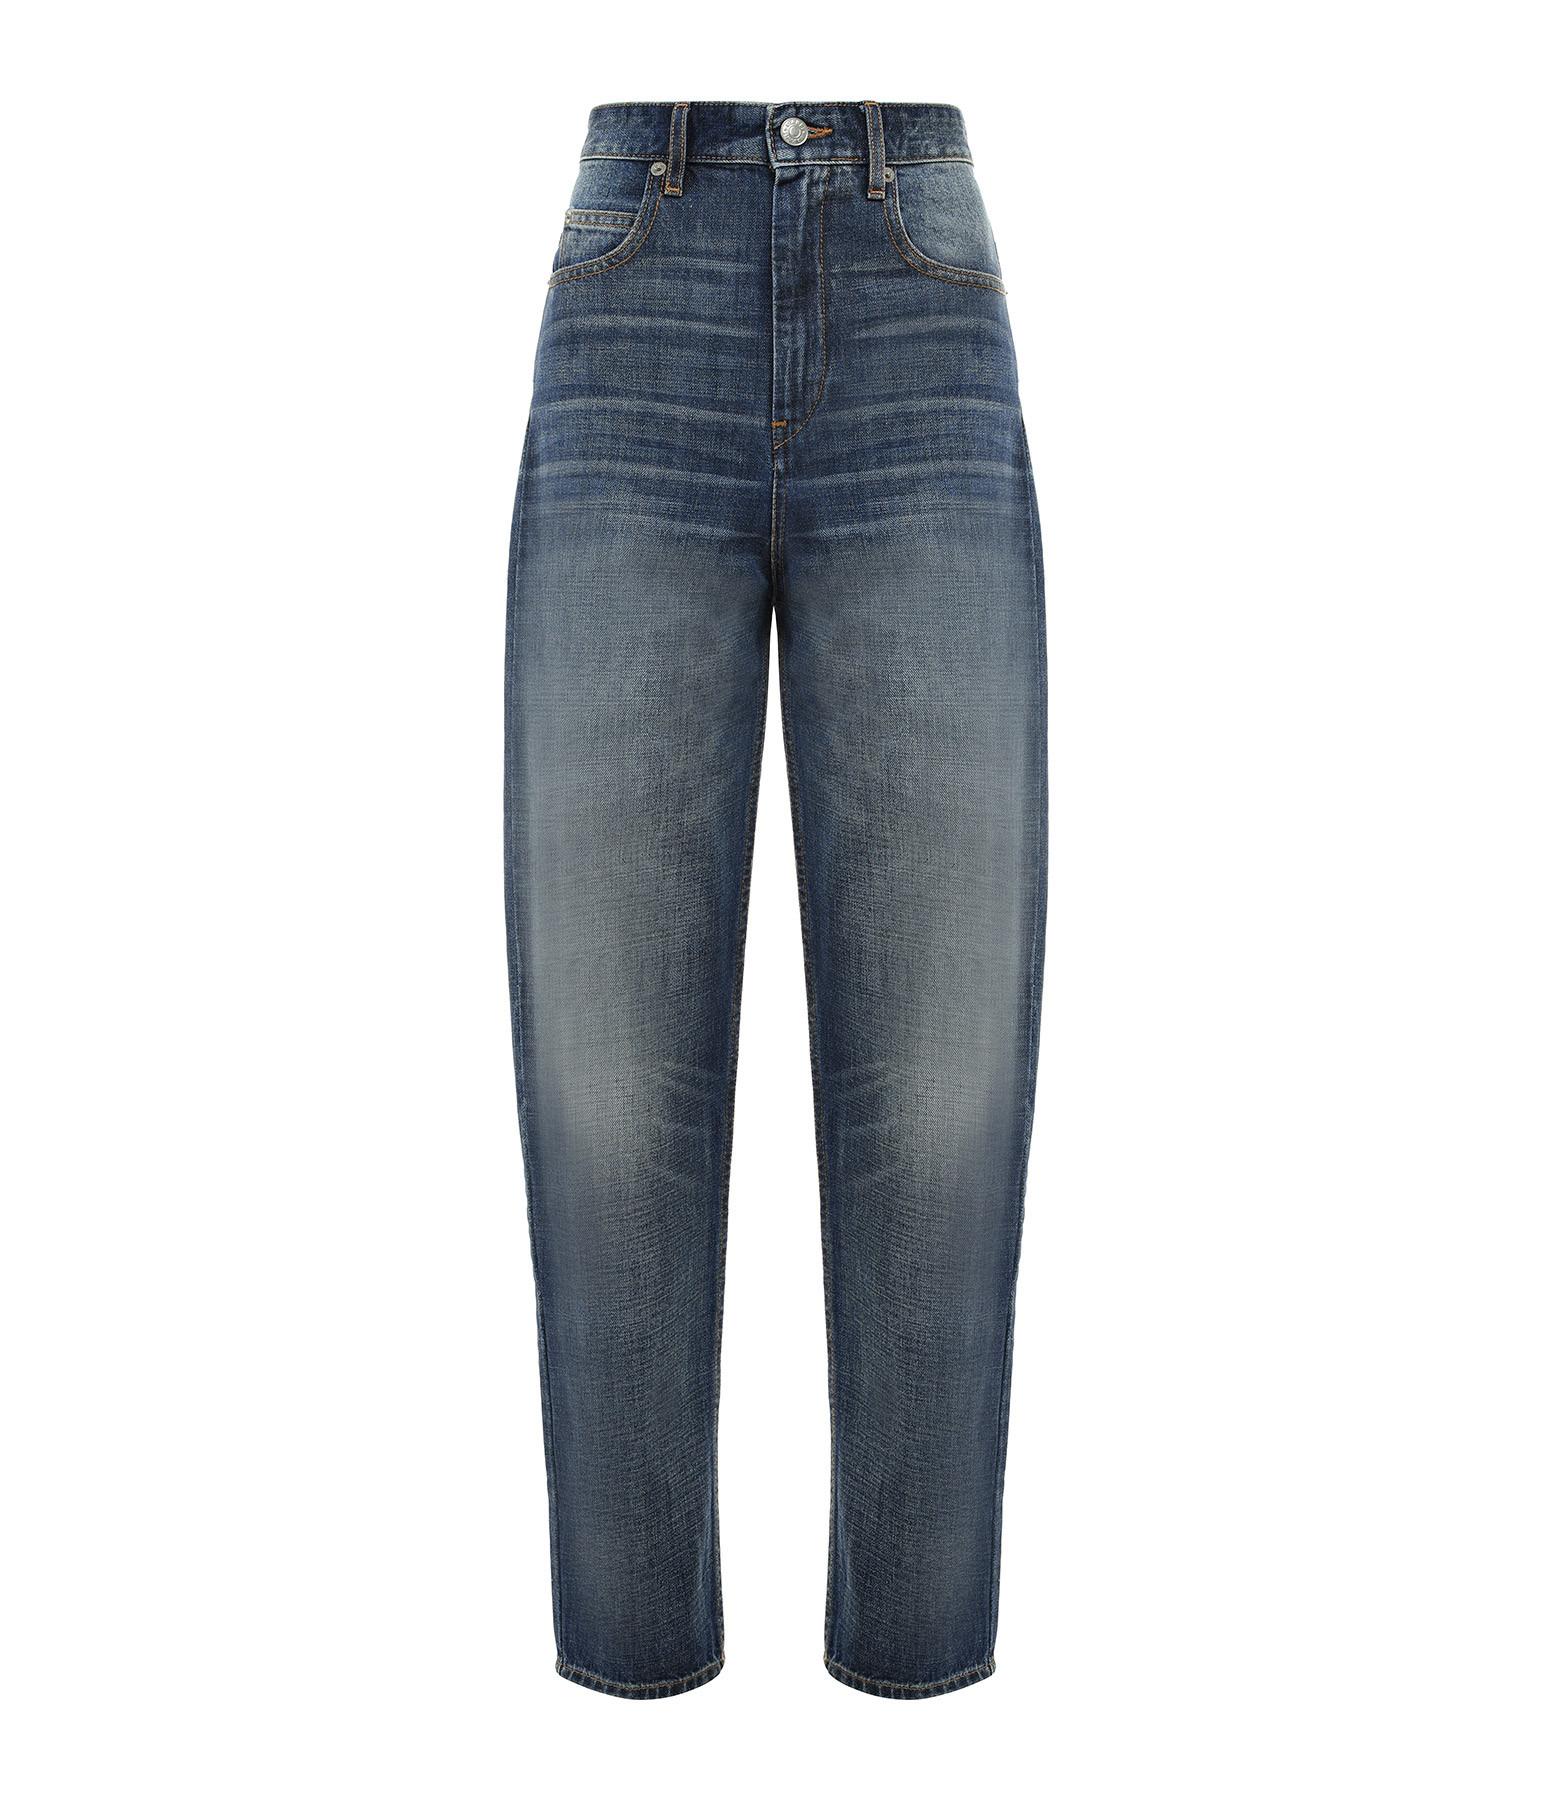 ISABEL MARANT ÉTOILE - Pantalon Corsyj Coton Bleu